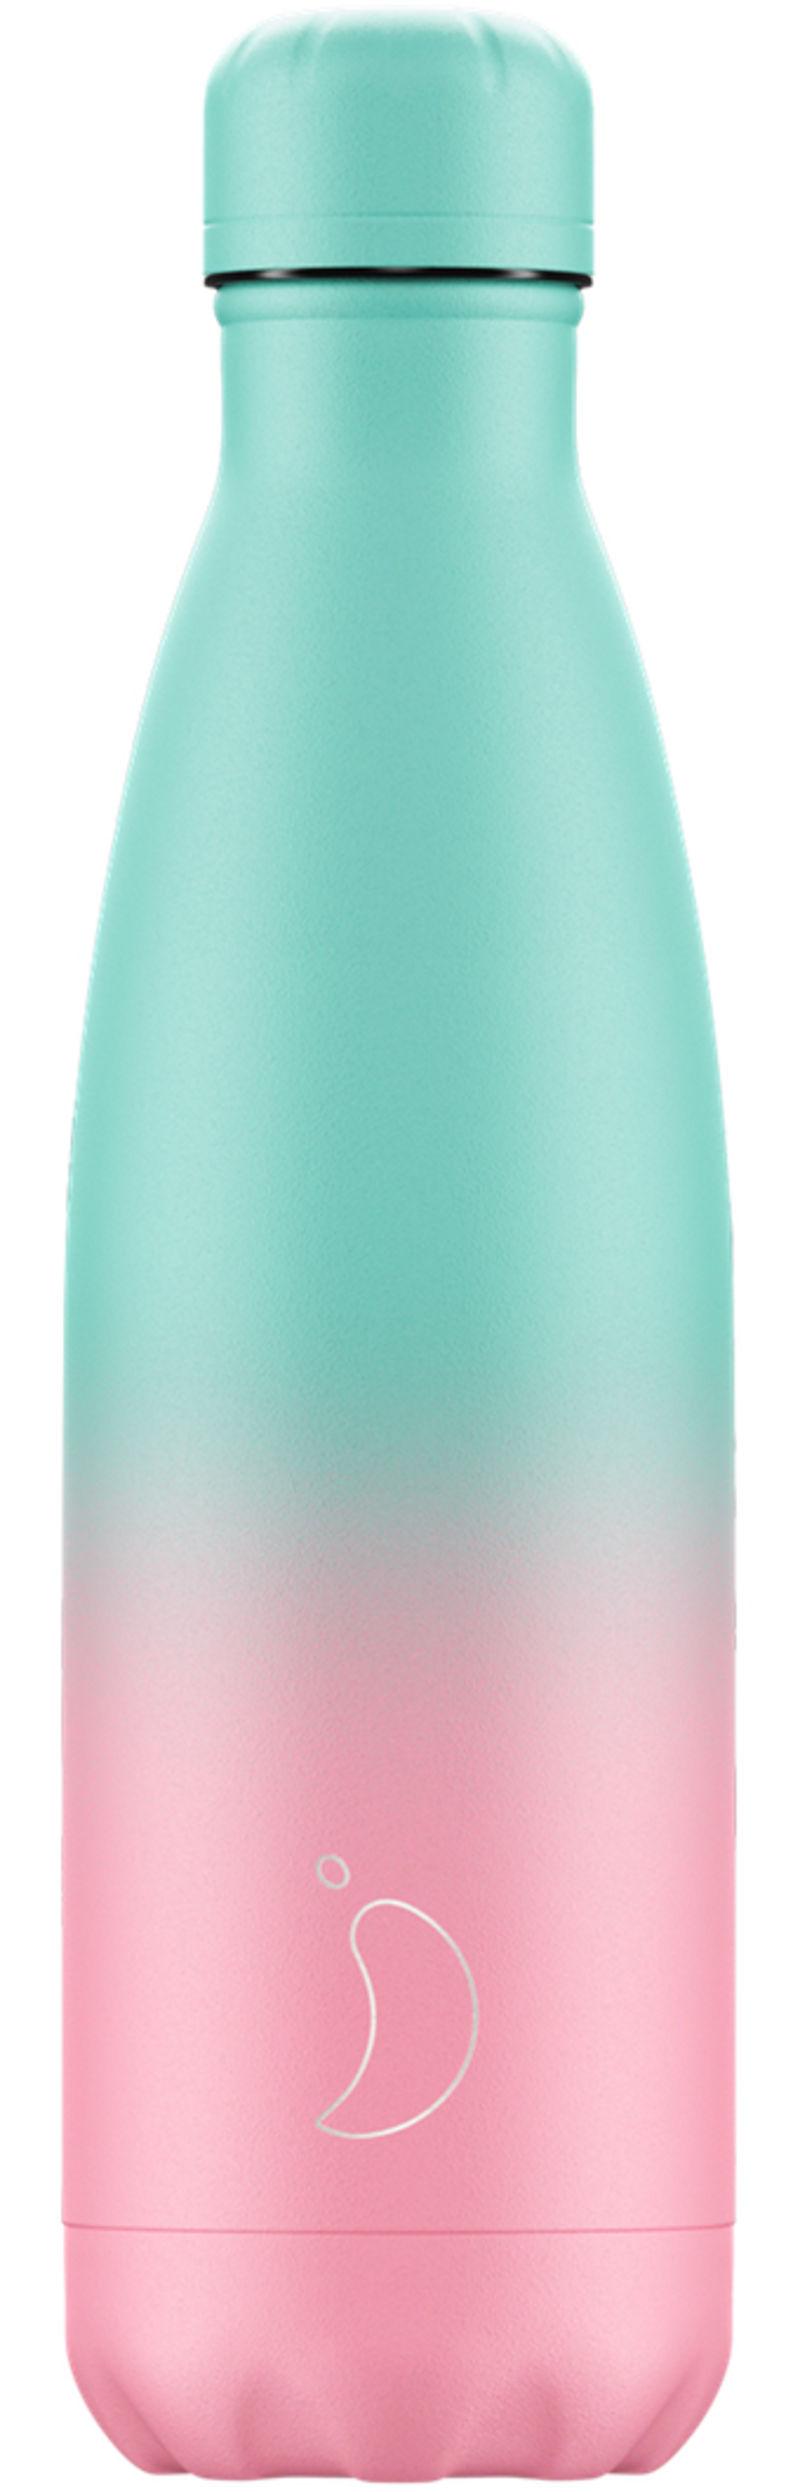 Botella Inox Gradient Pastel Menta&rosa 500ml -